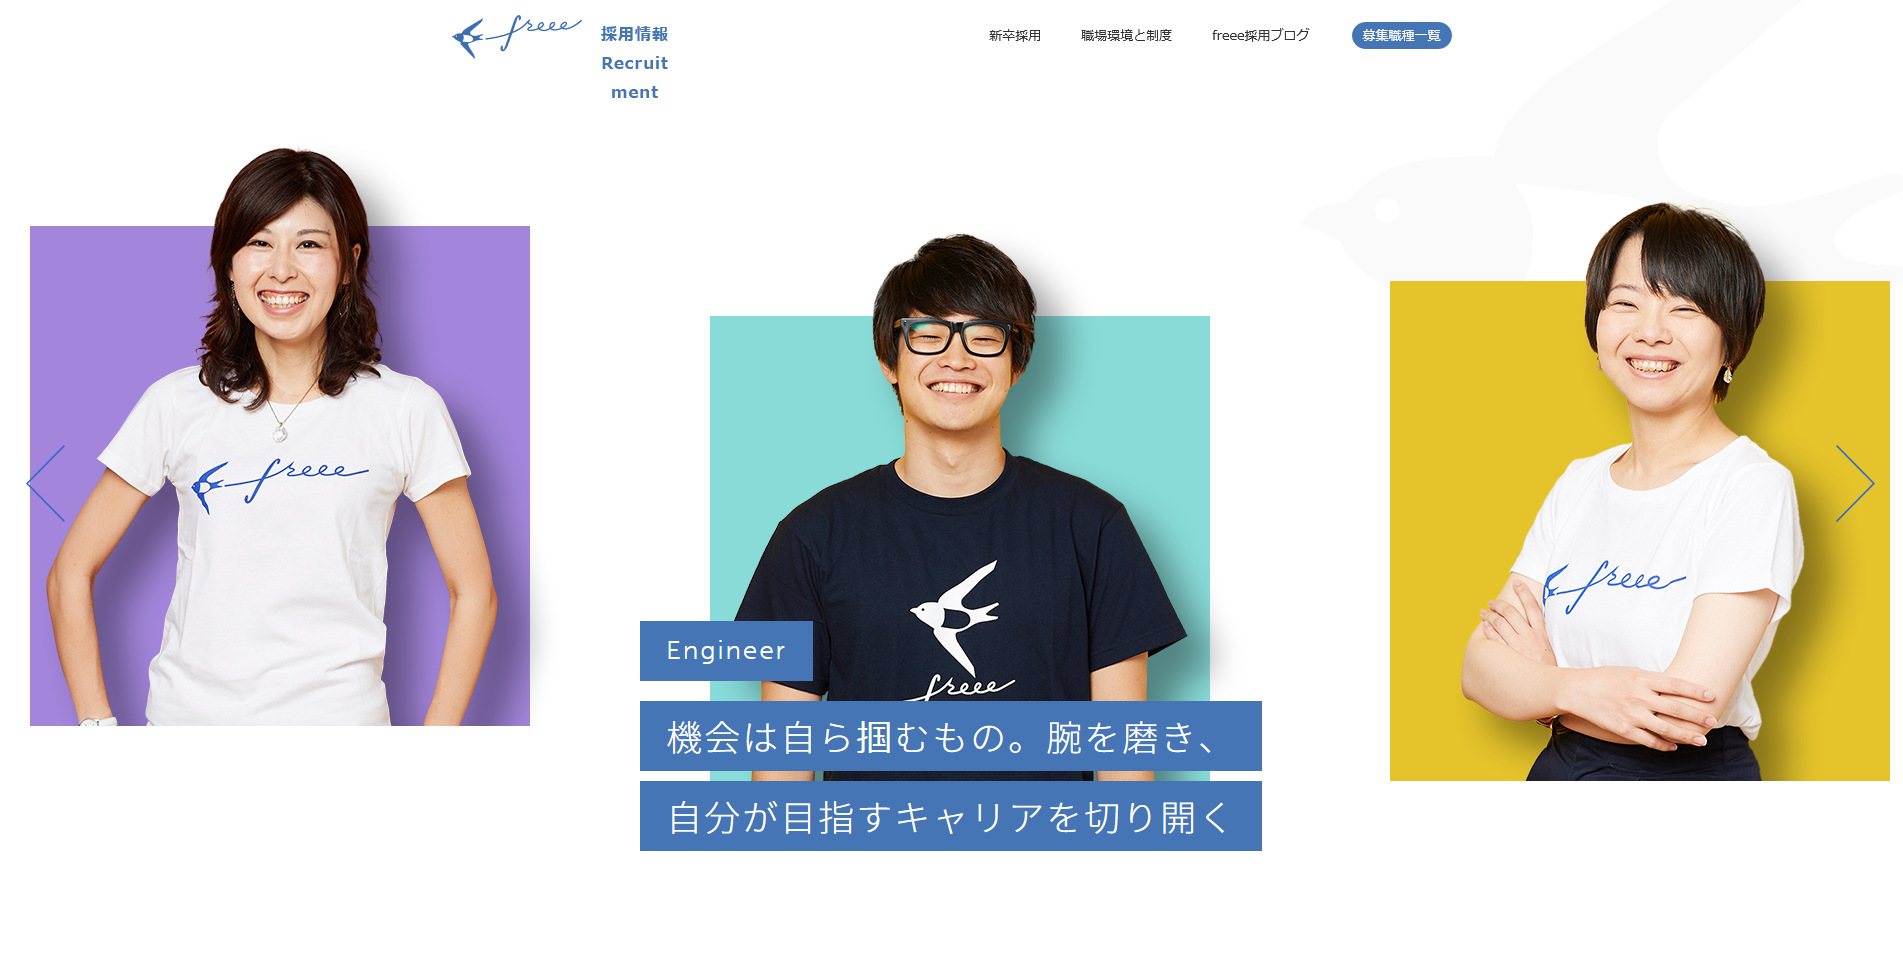 freee株式会社